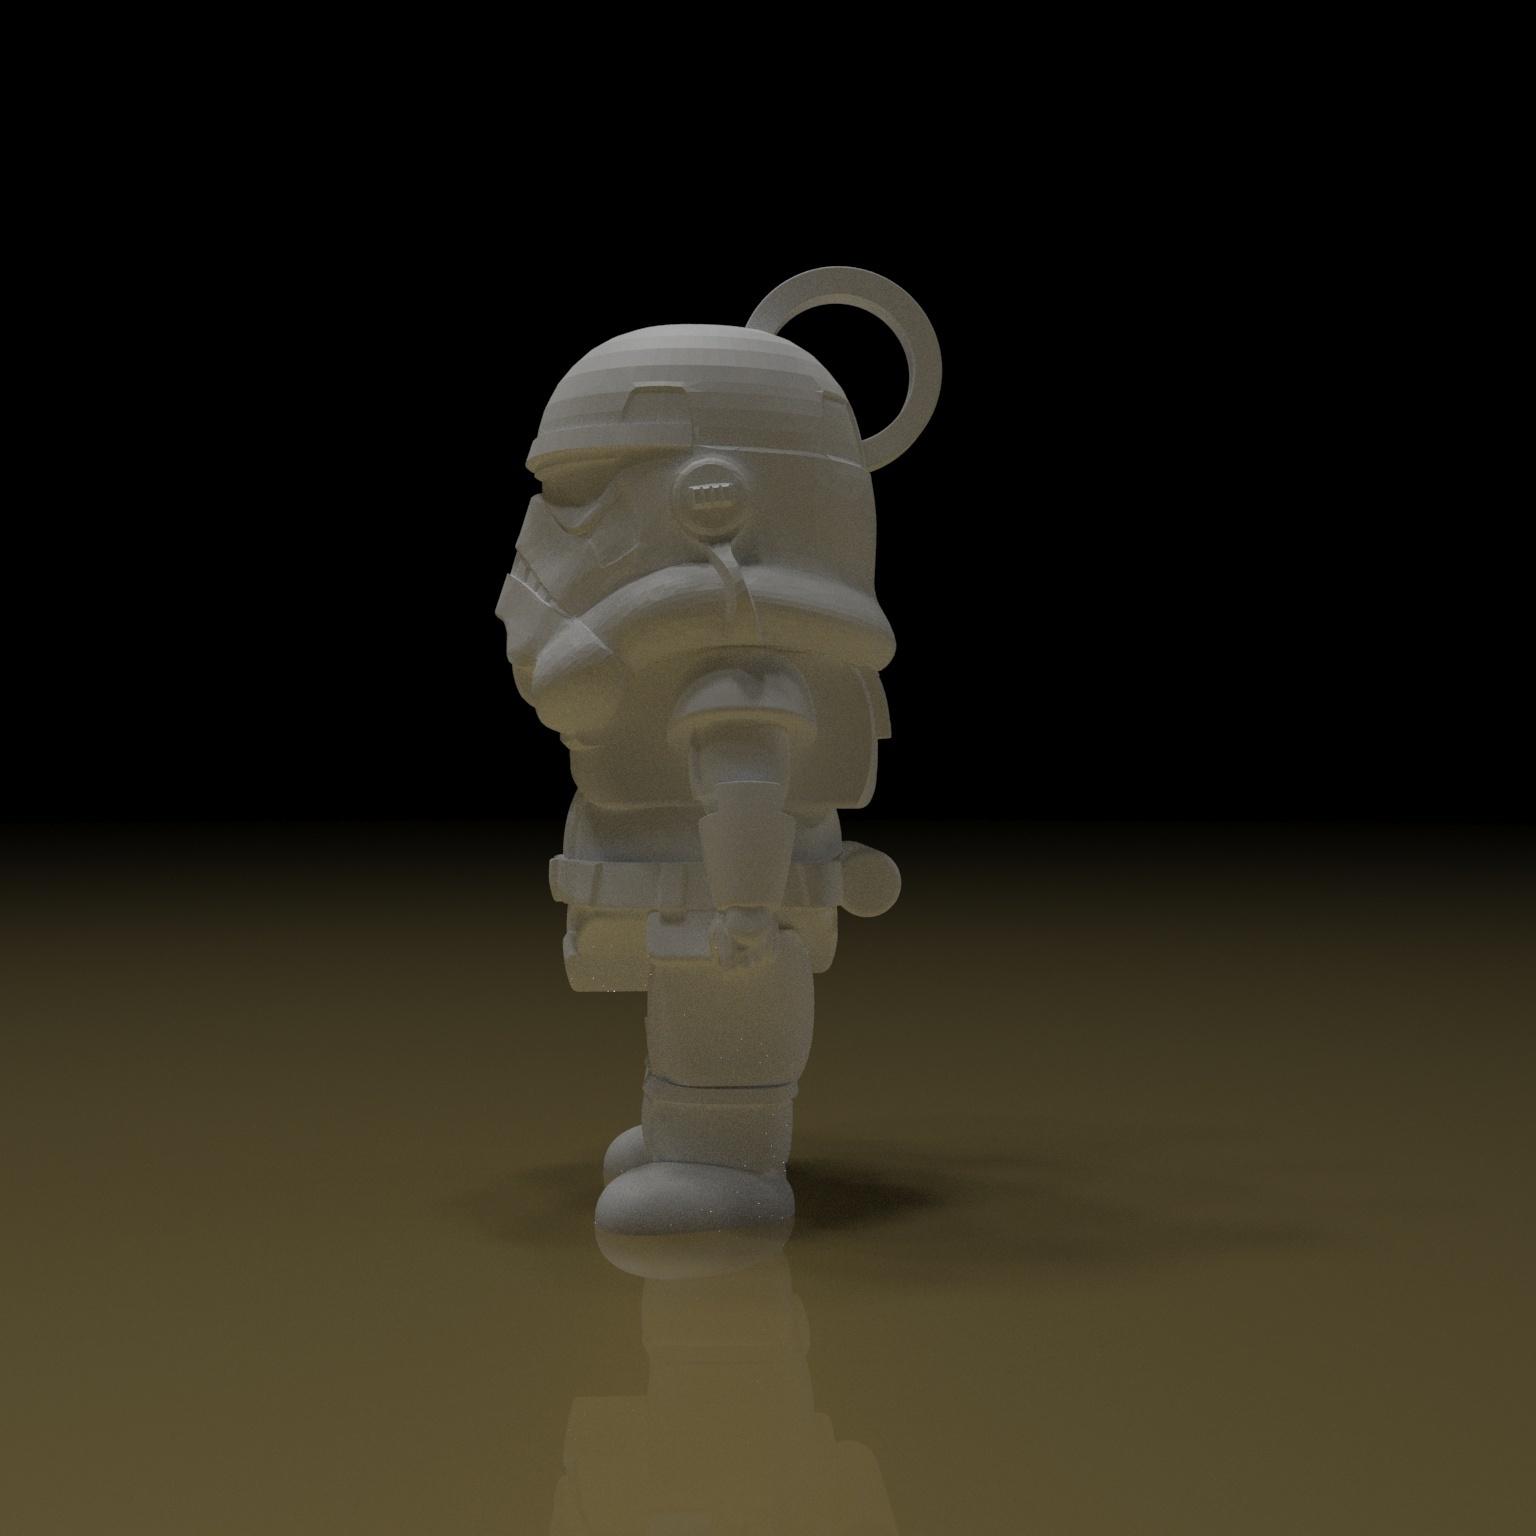 4.jpg Download free STL file STORMTROOPER KEY CHAIN • 3D printing template, paltony22